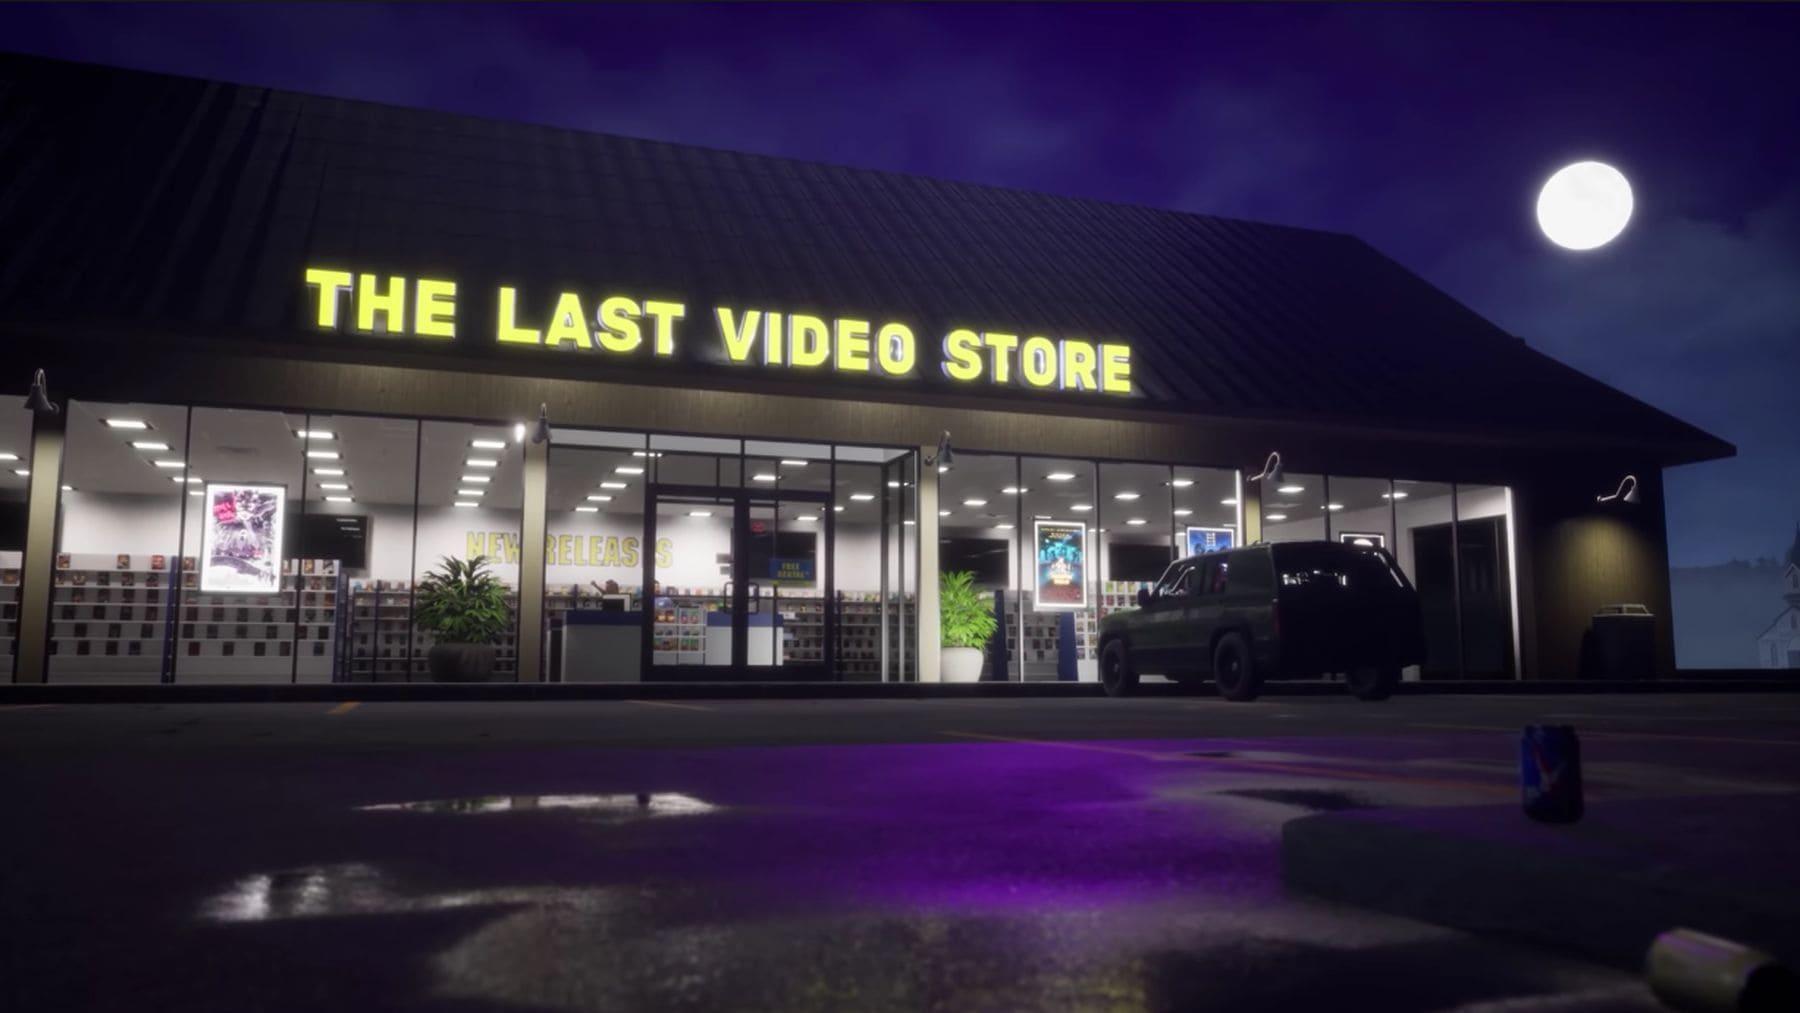 VR-Spiel: The Last Video Store   Games   Was is hier eigentlich los?